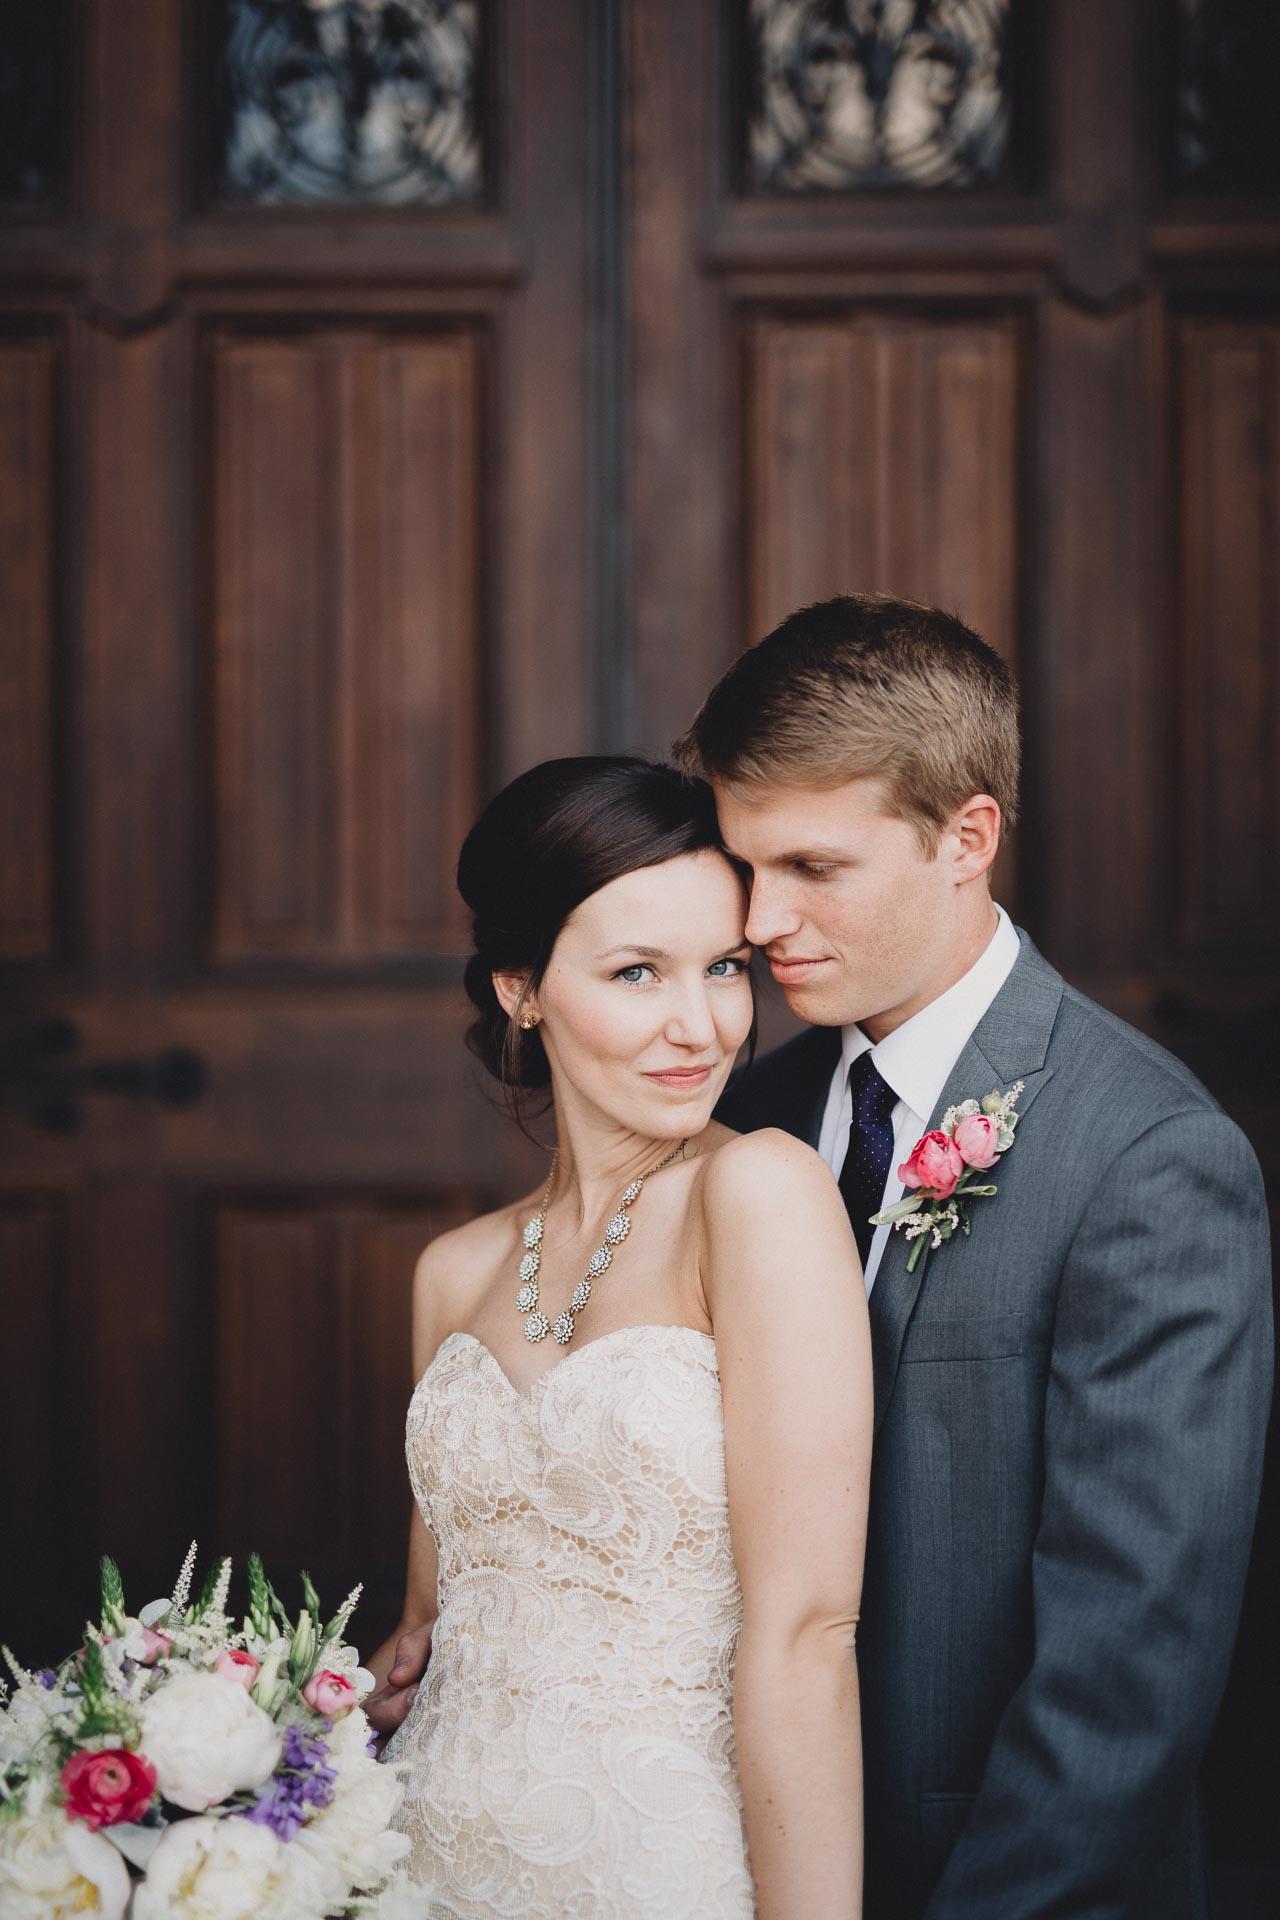 Julia-Michael-Cincinnati-Music-Hall-Wedding-081@2x.jpg